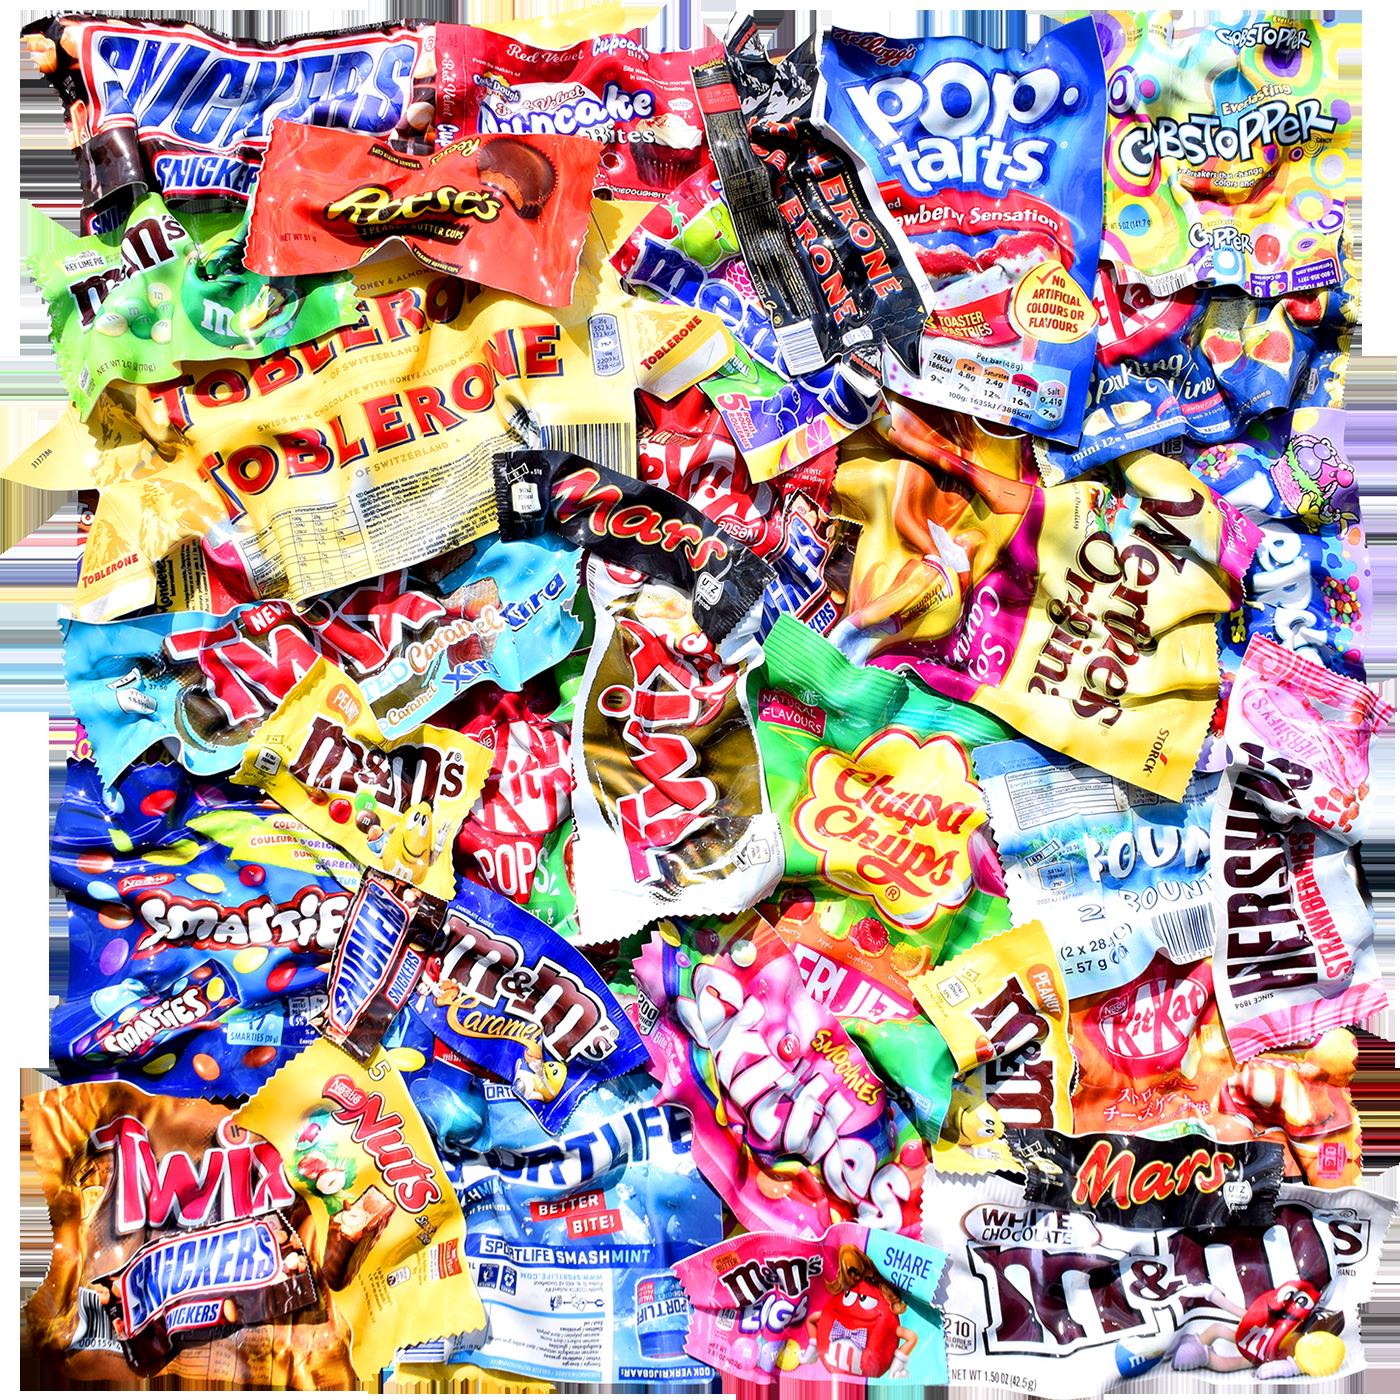 Floyd Douglas - Art Candy (Twix-Chupa Chups) , 0656-012-100